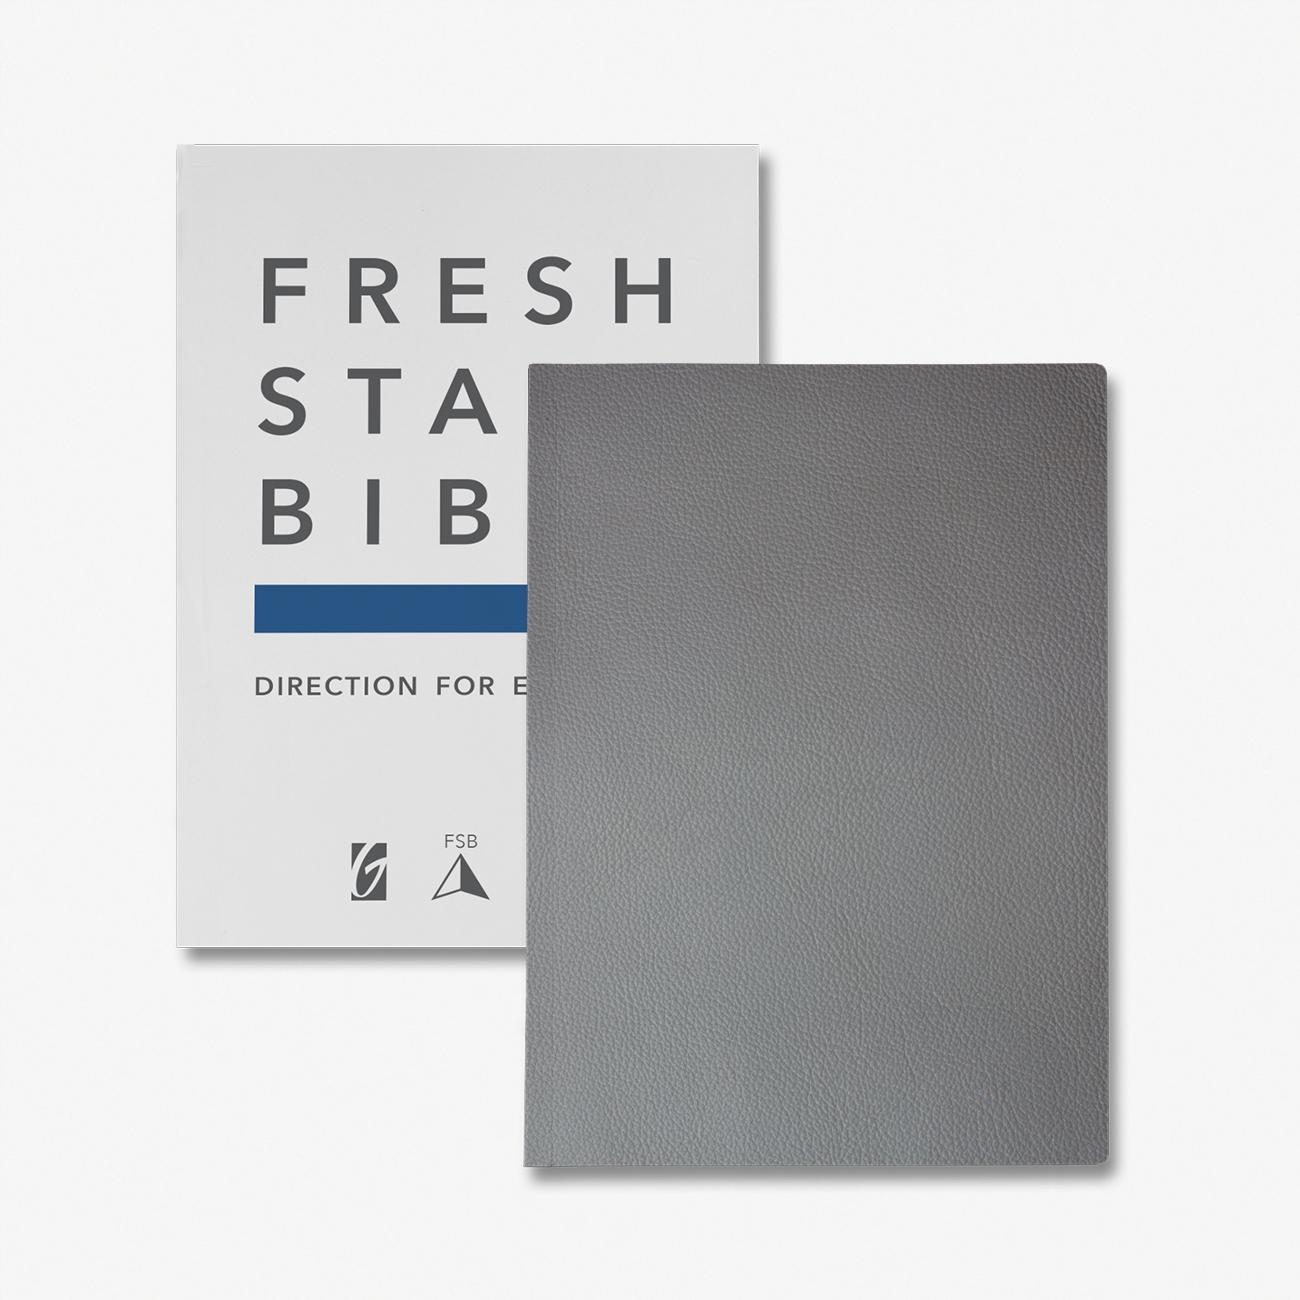 Premium edition - Genuine Leather$69.99ISBN: 978-1-949399-61-5